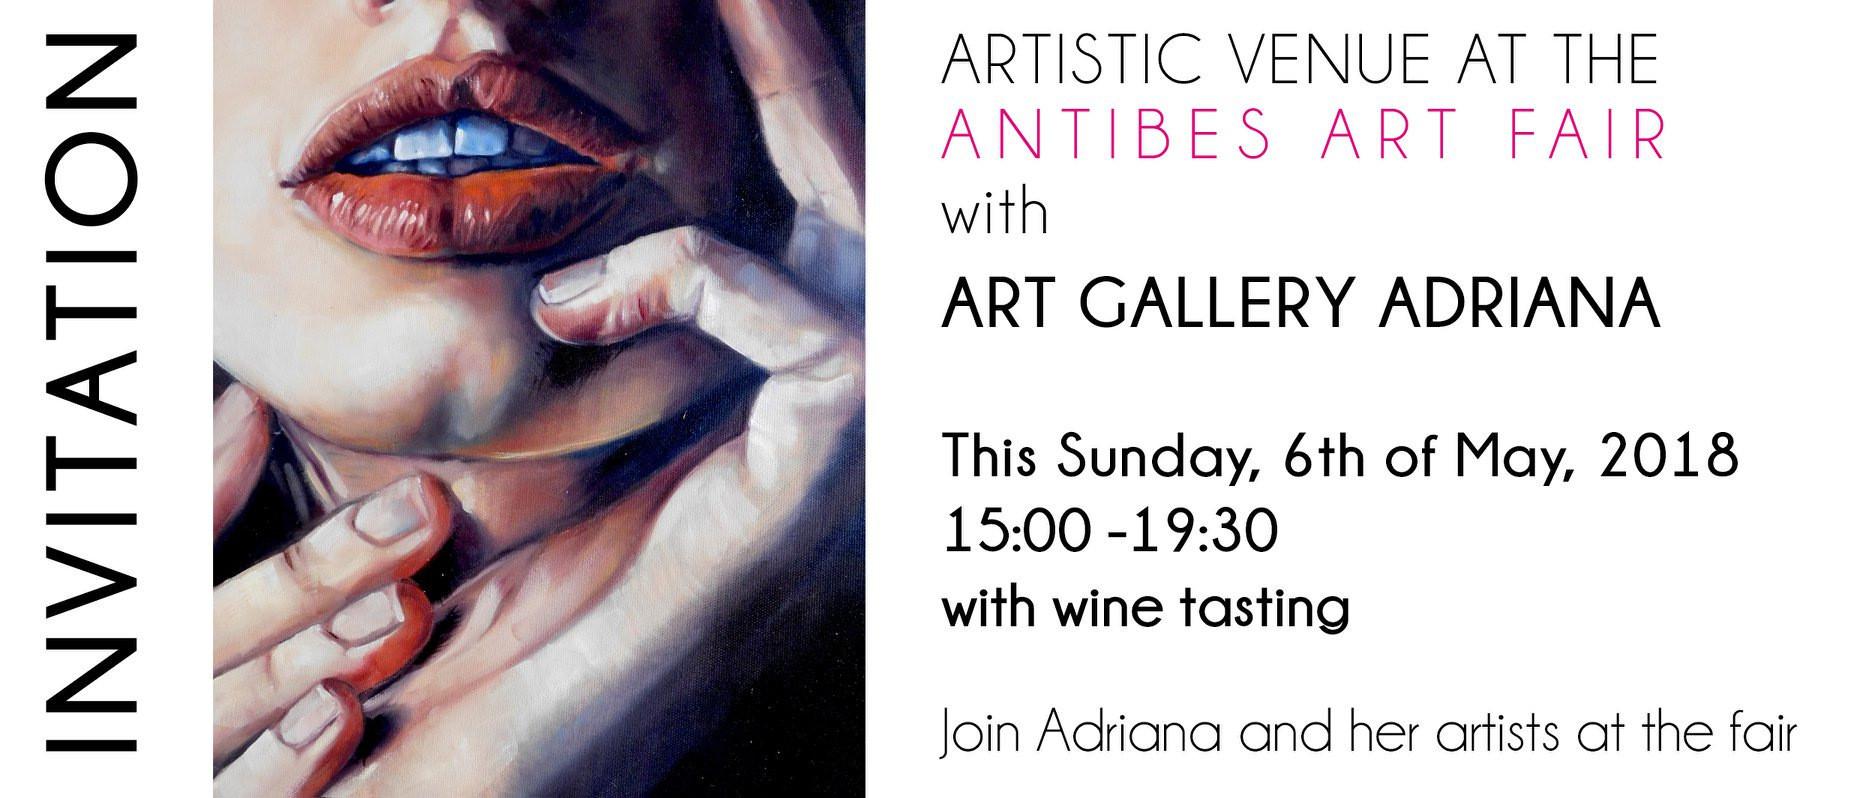 Art Gallery Adriana